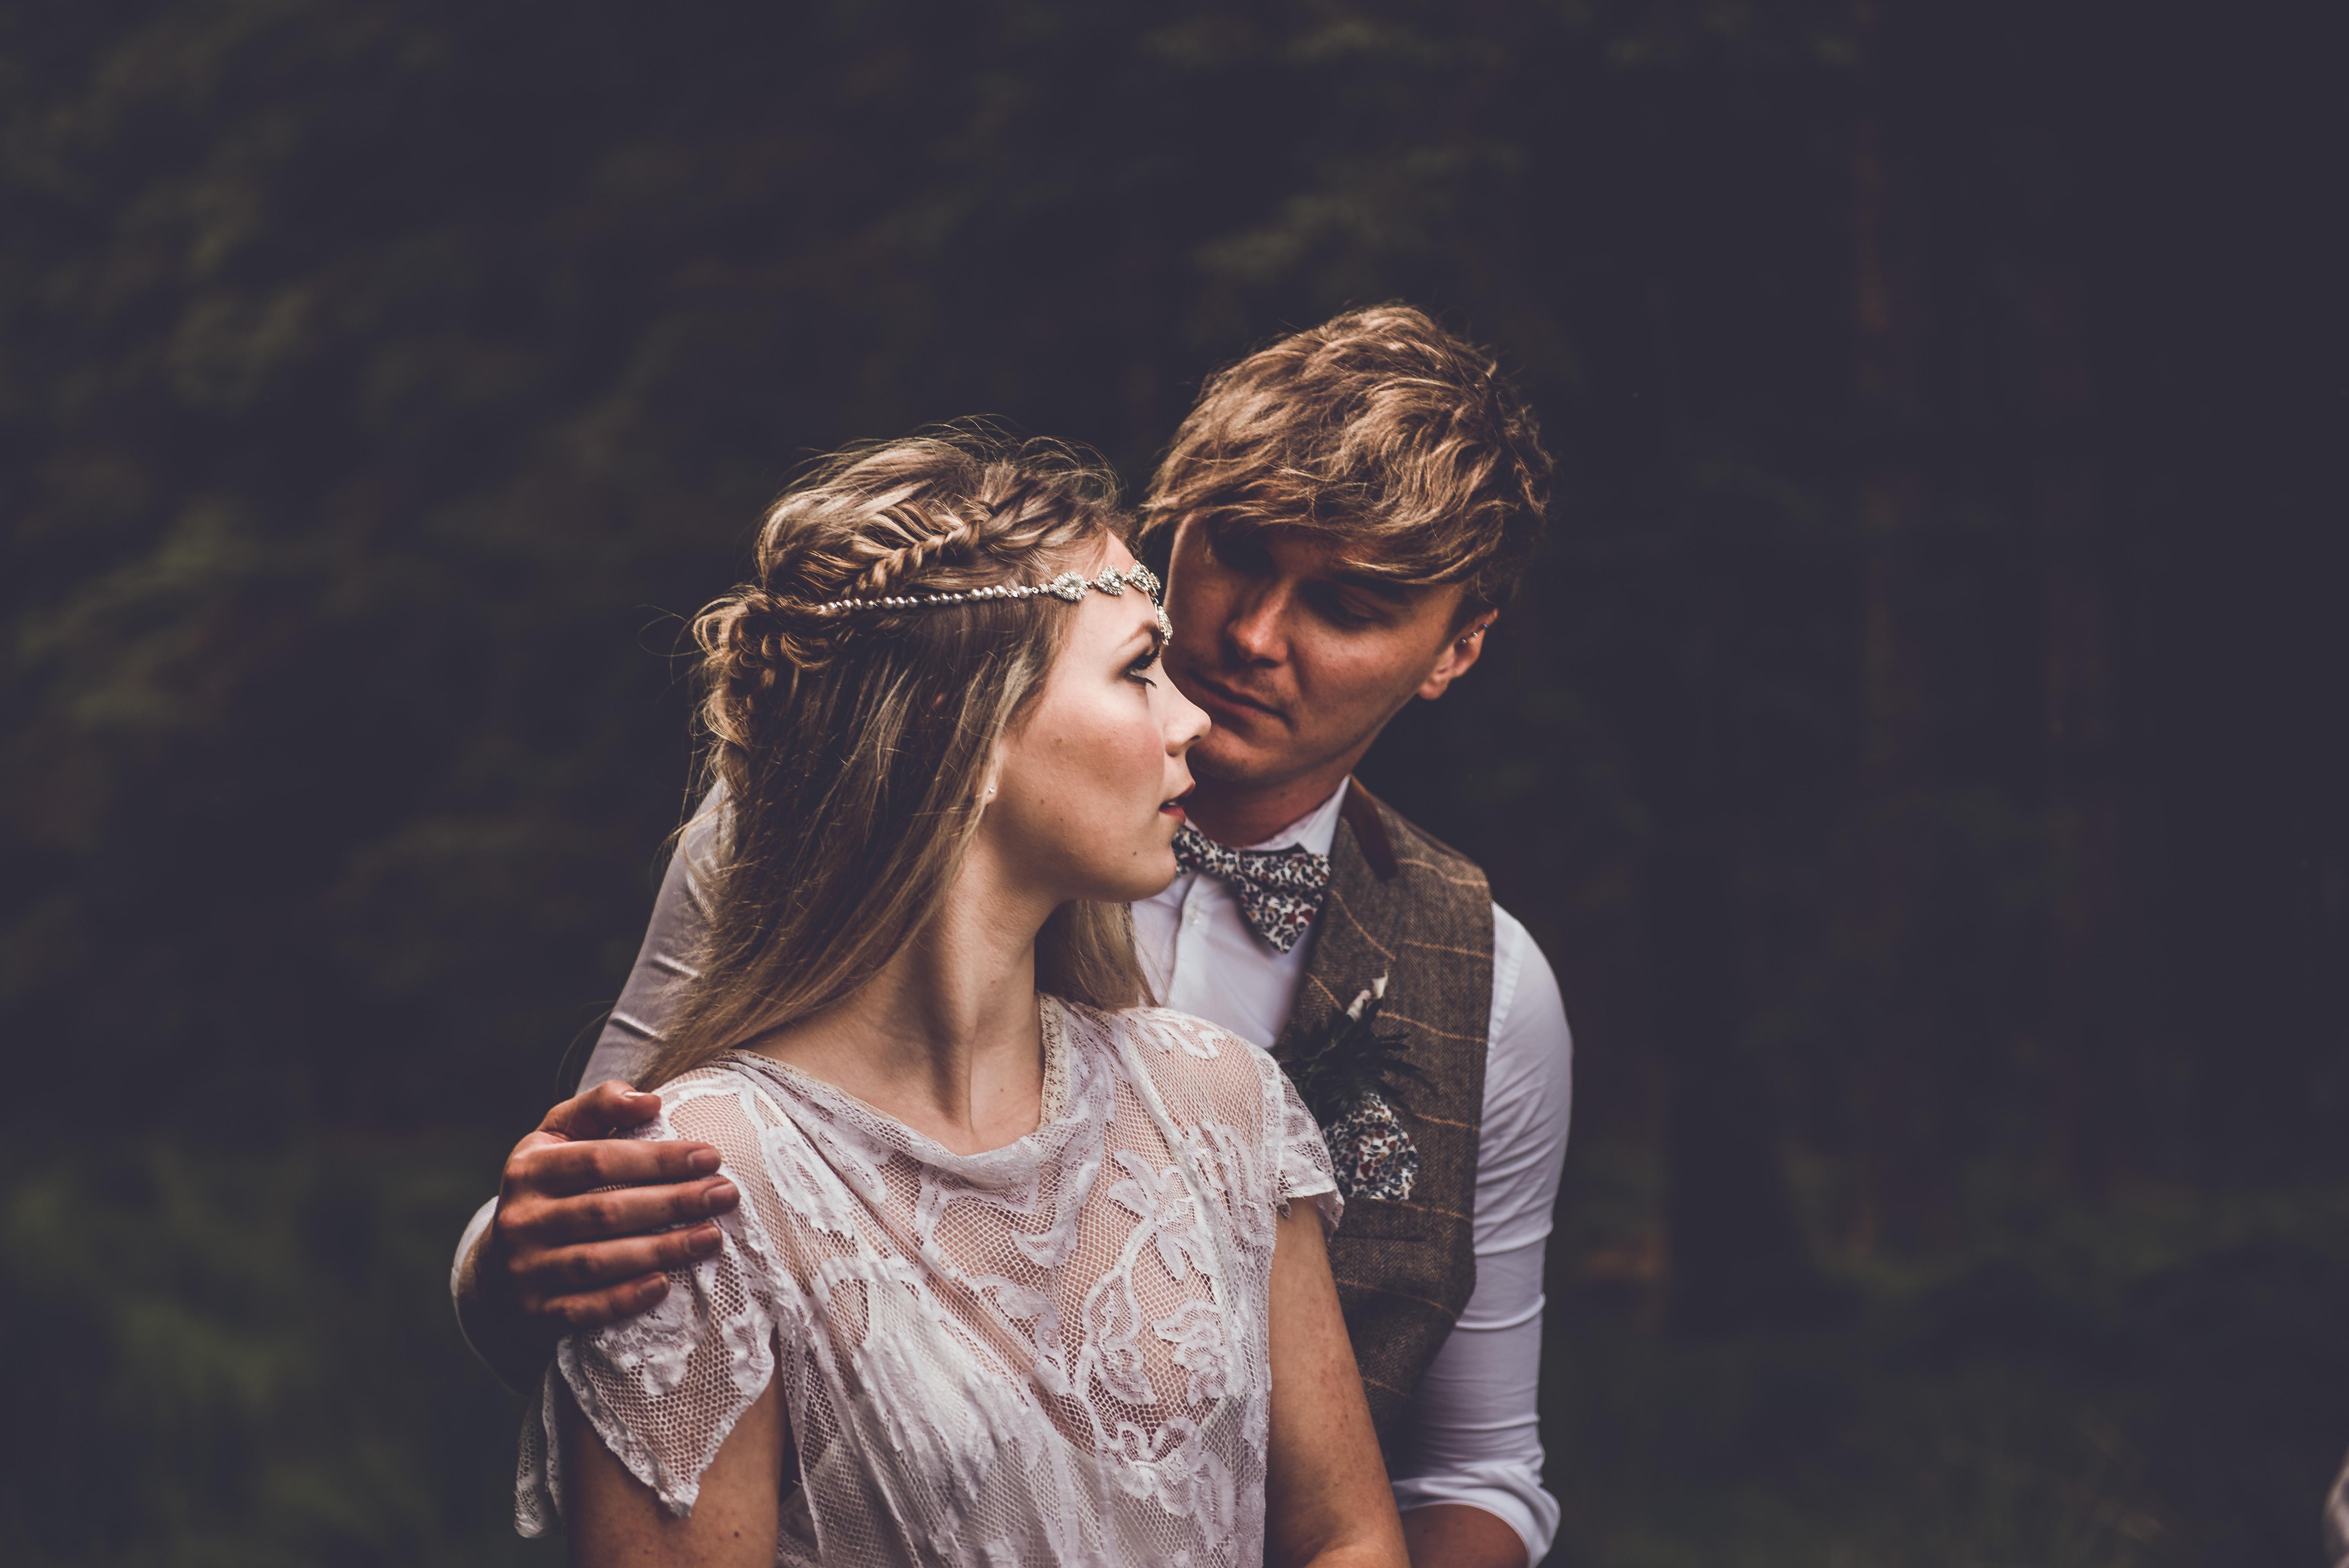 Into the wild groom style